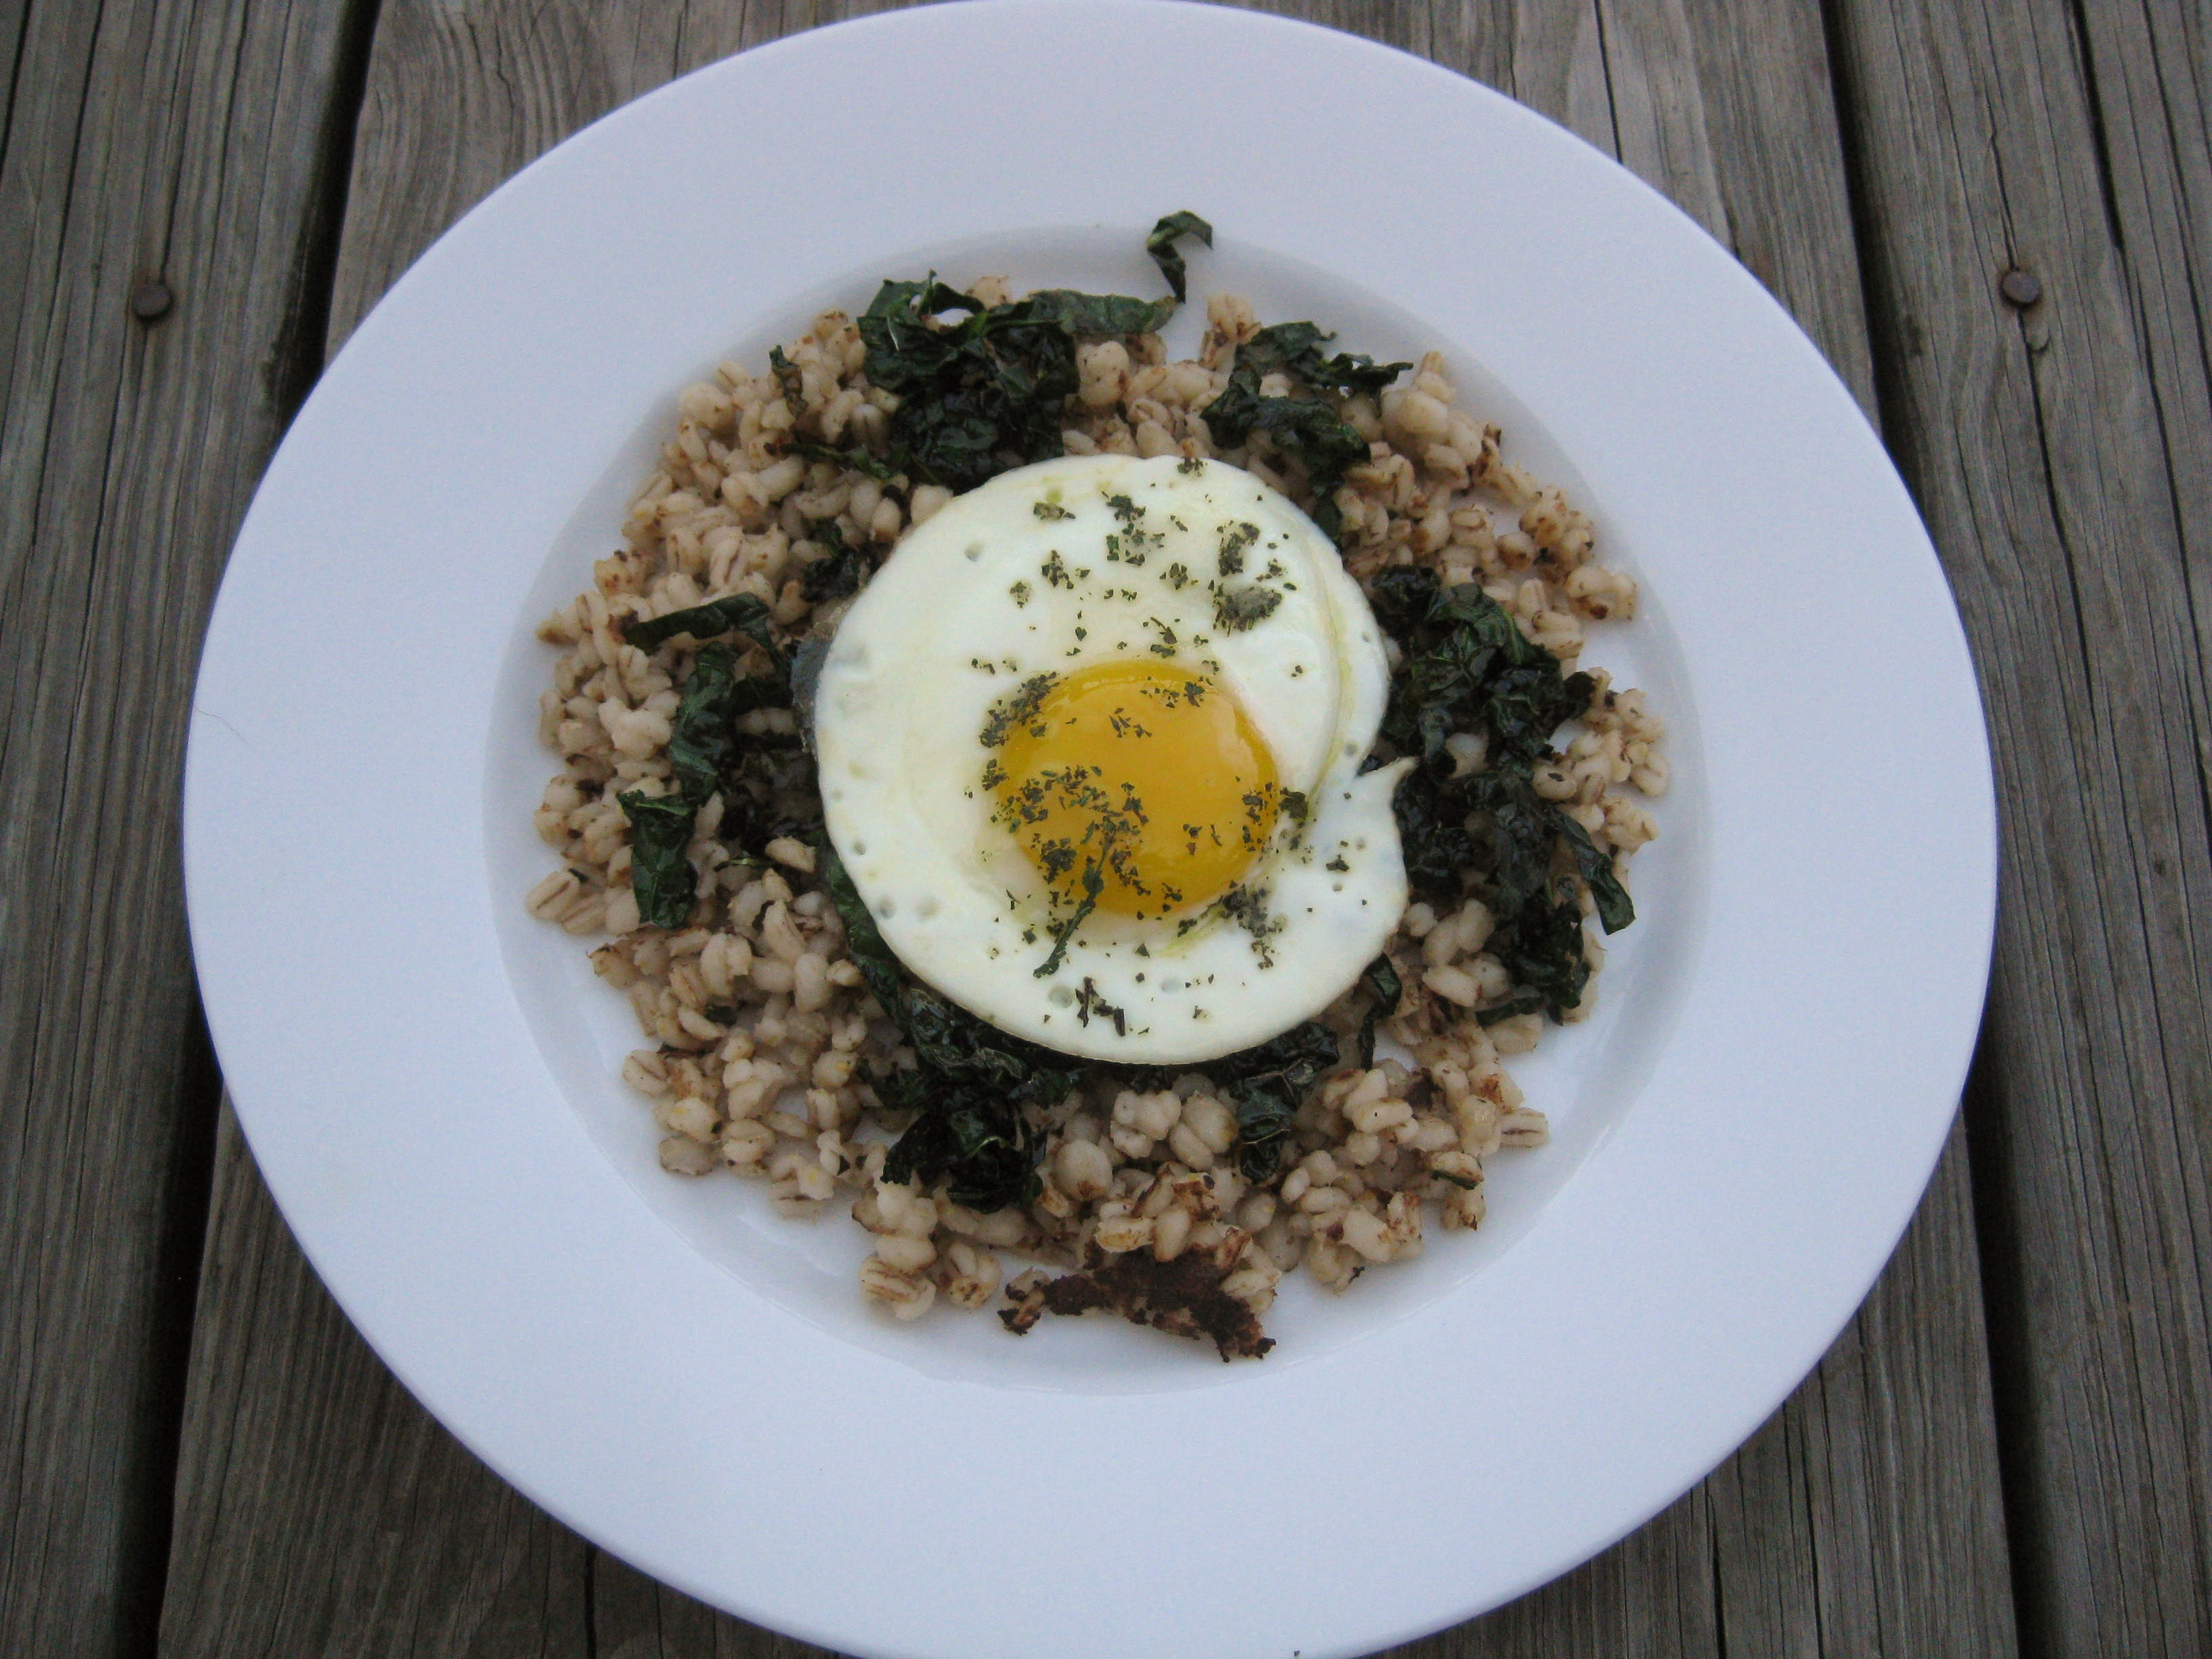 Fried Egg on Kale and Barley